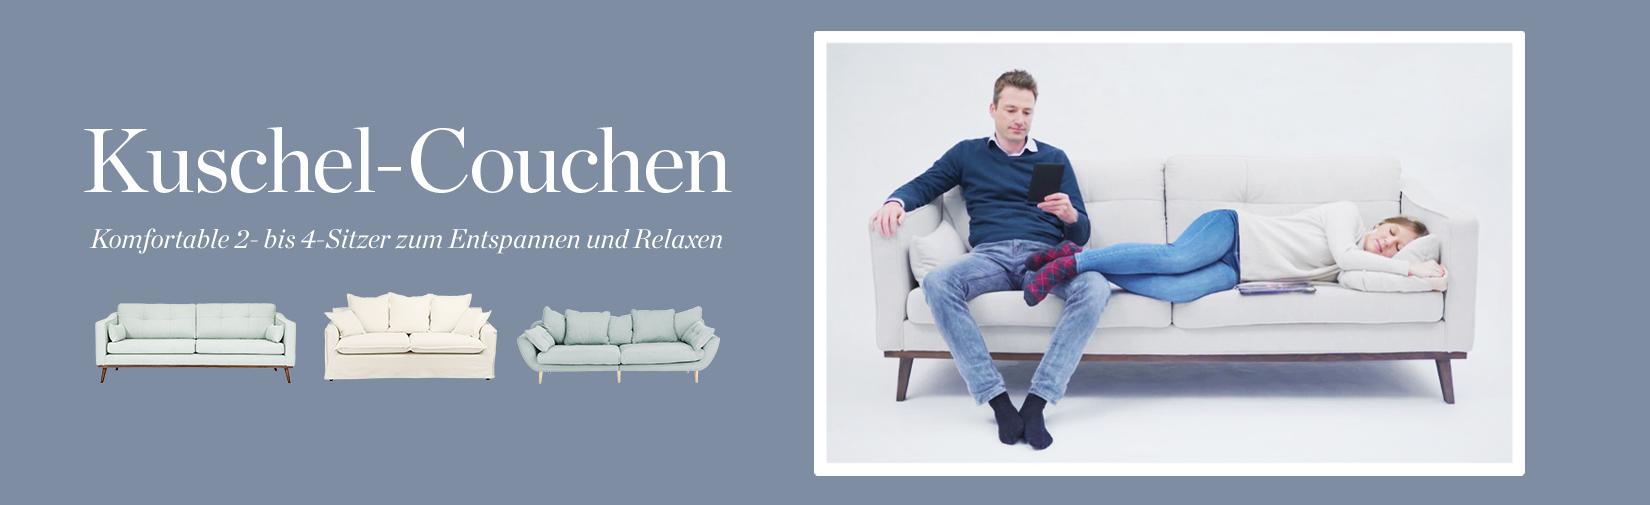 LP_KuschelCouchen_desktop_NEU